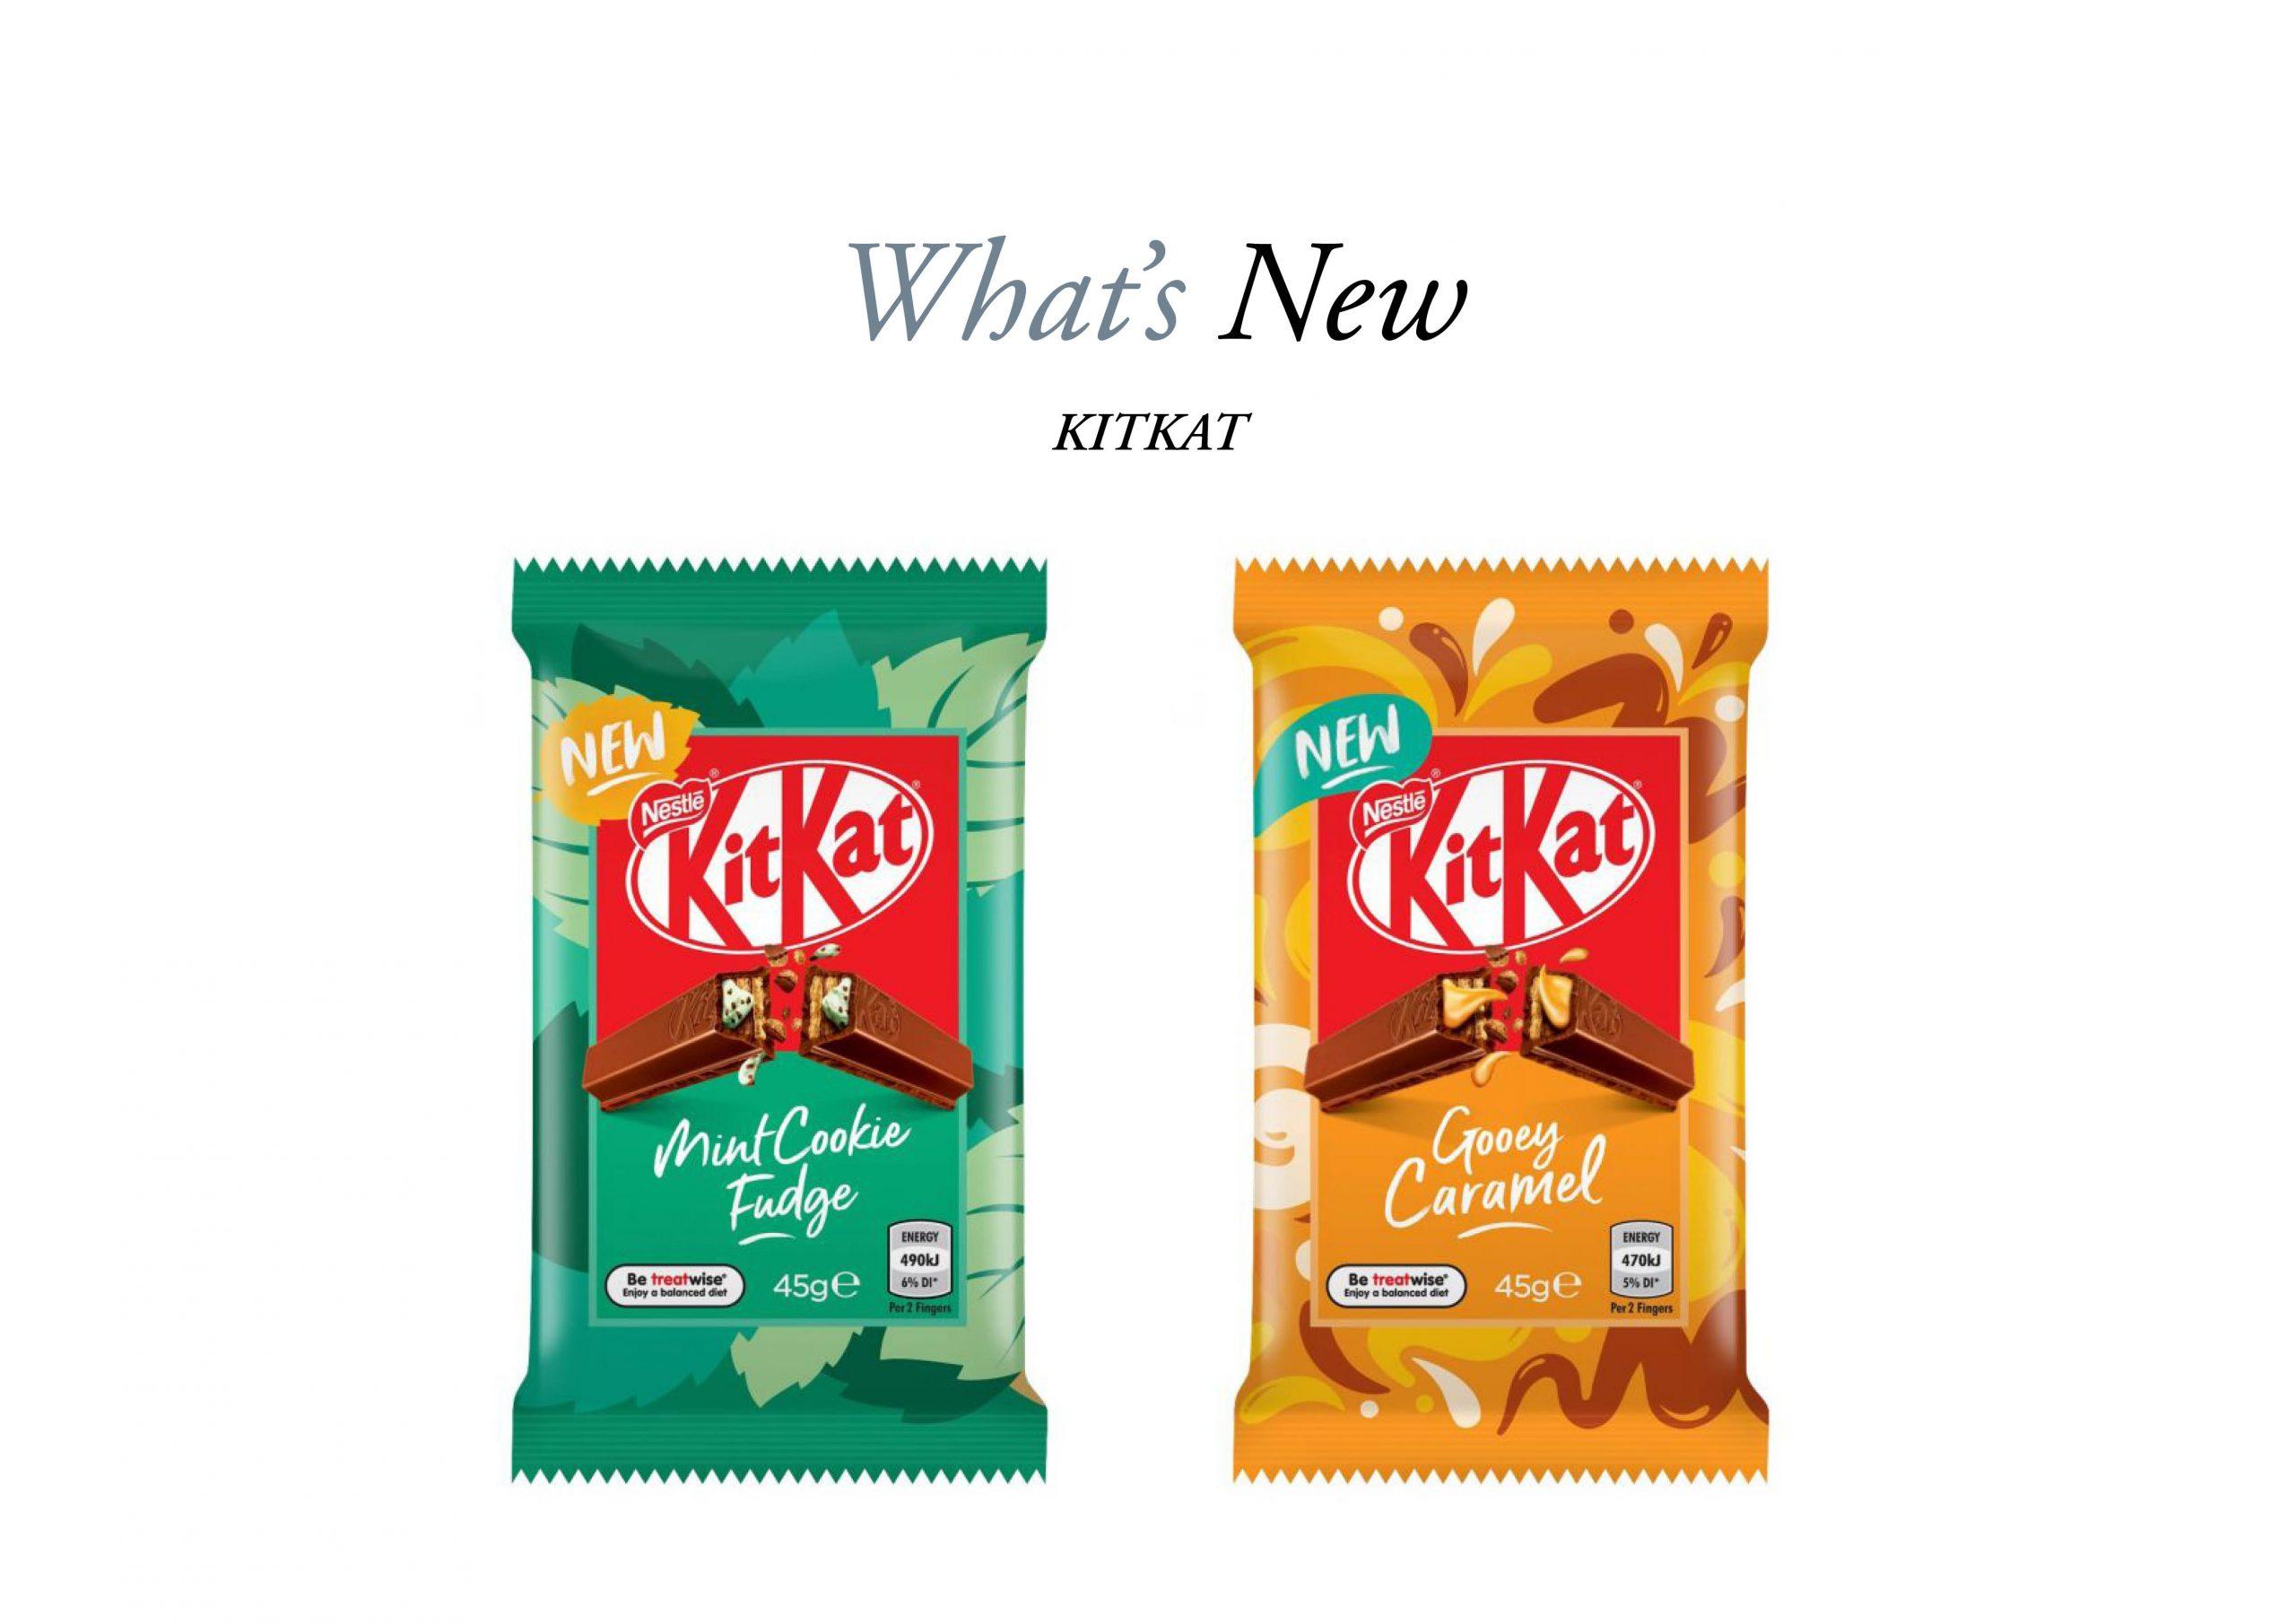 Packets of KitKat Fudge